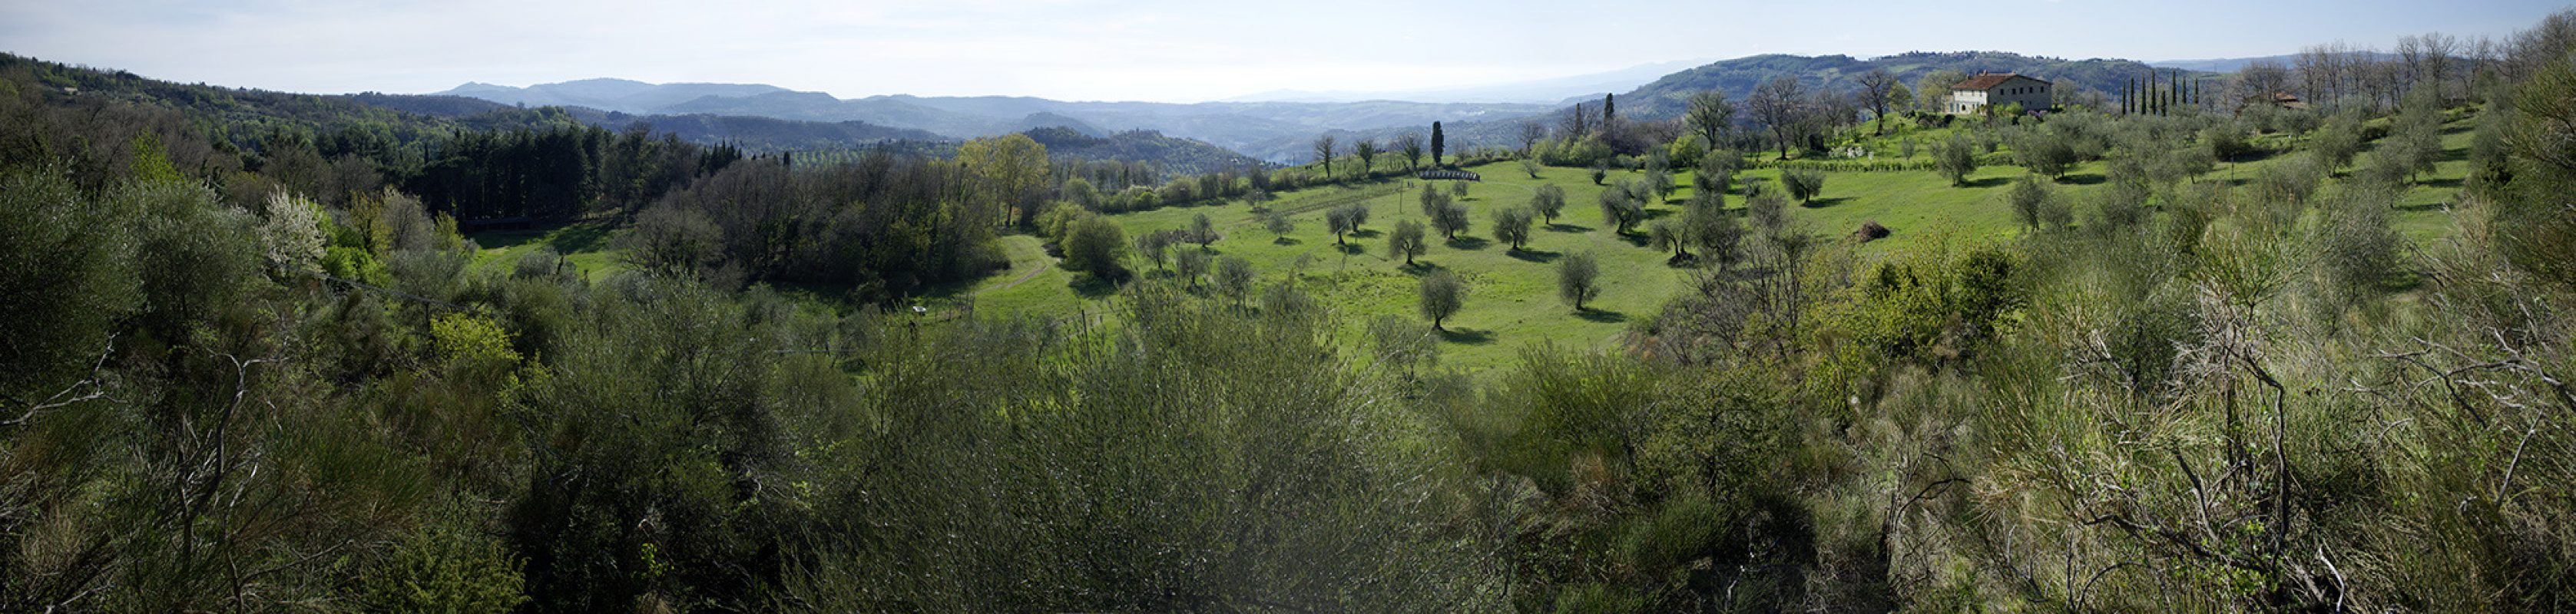 Toskana, Landschaft, Panorama, Il Giardino di Daniel Spoerri